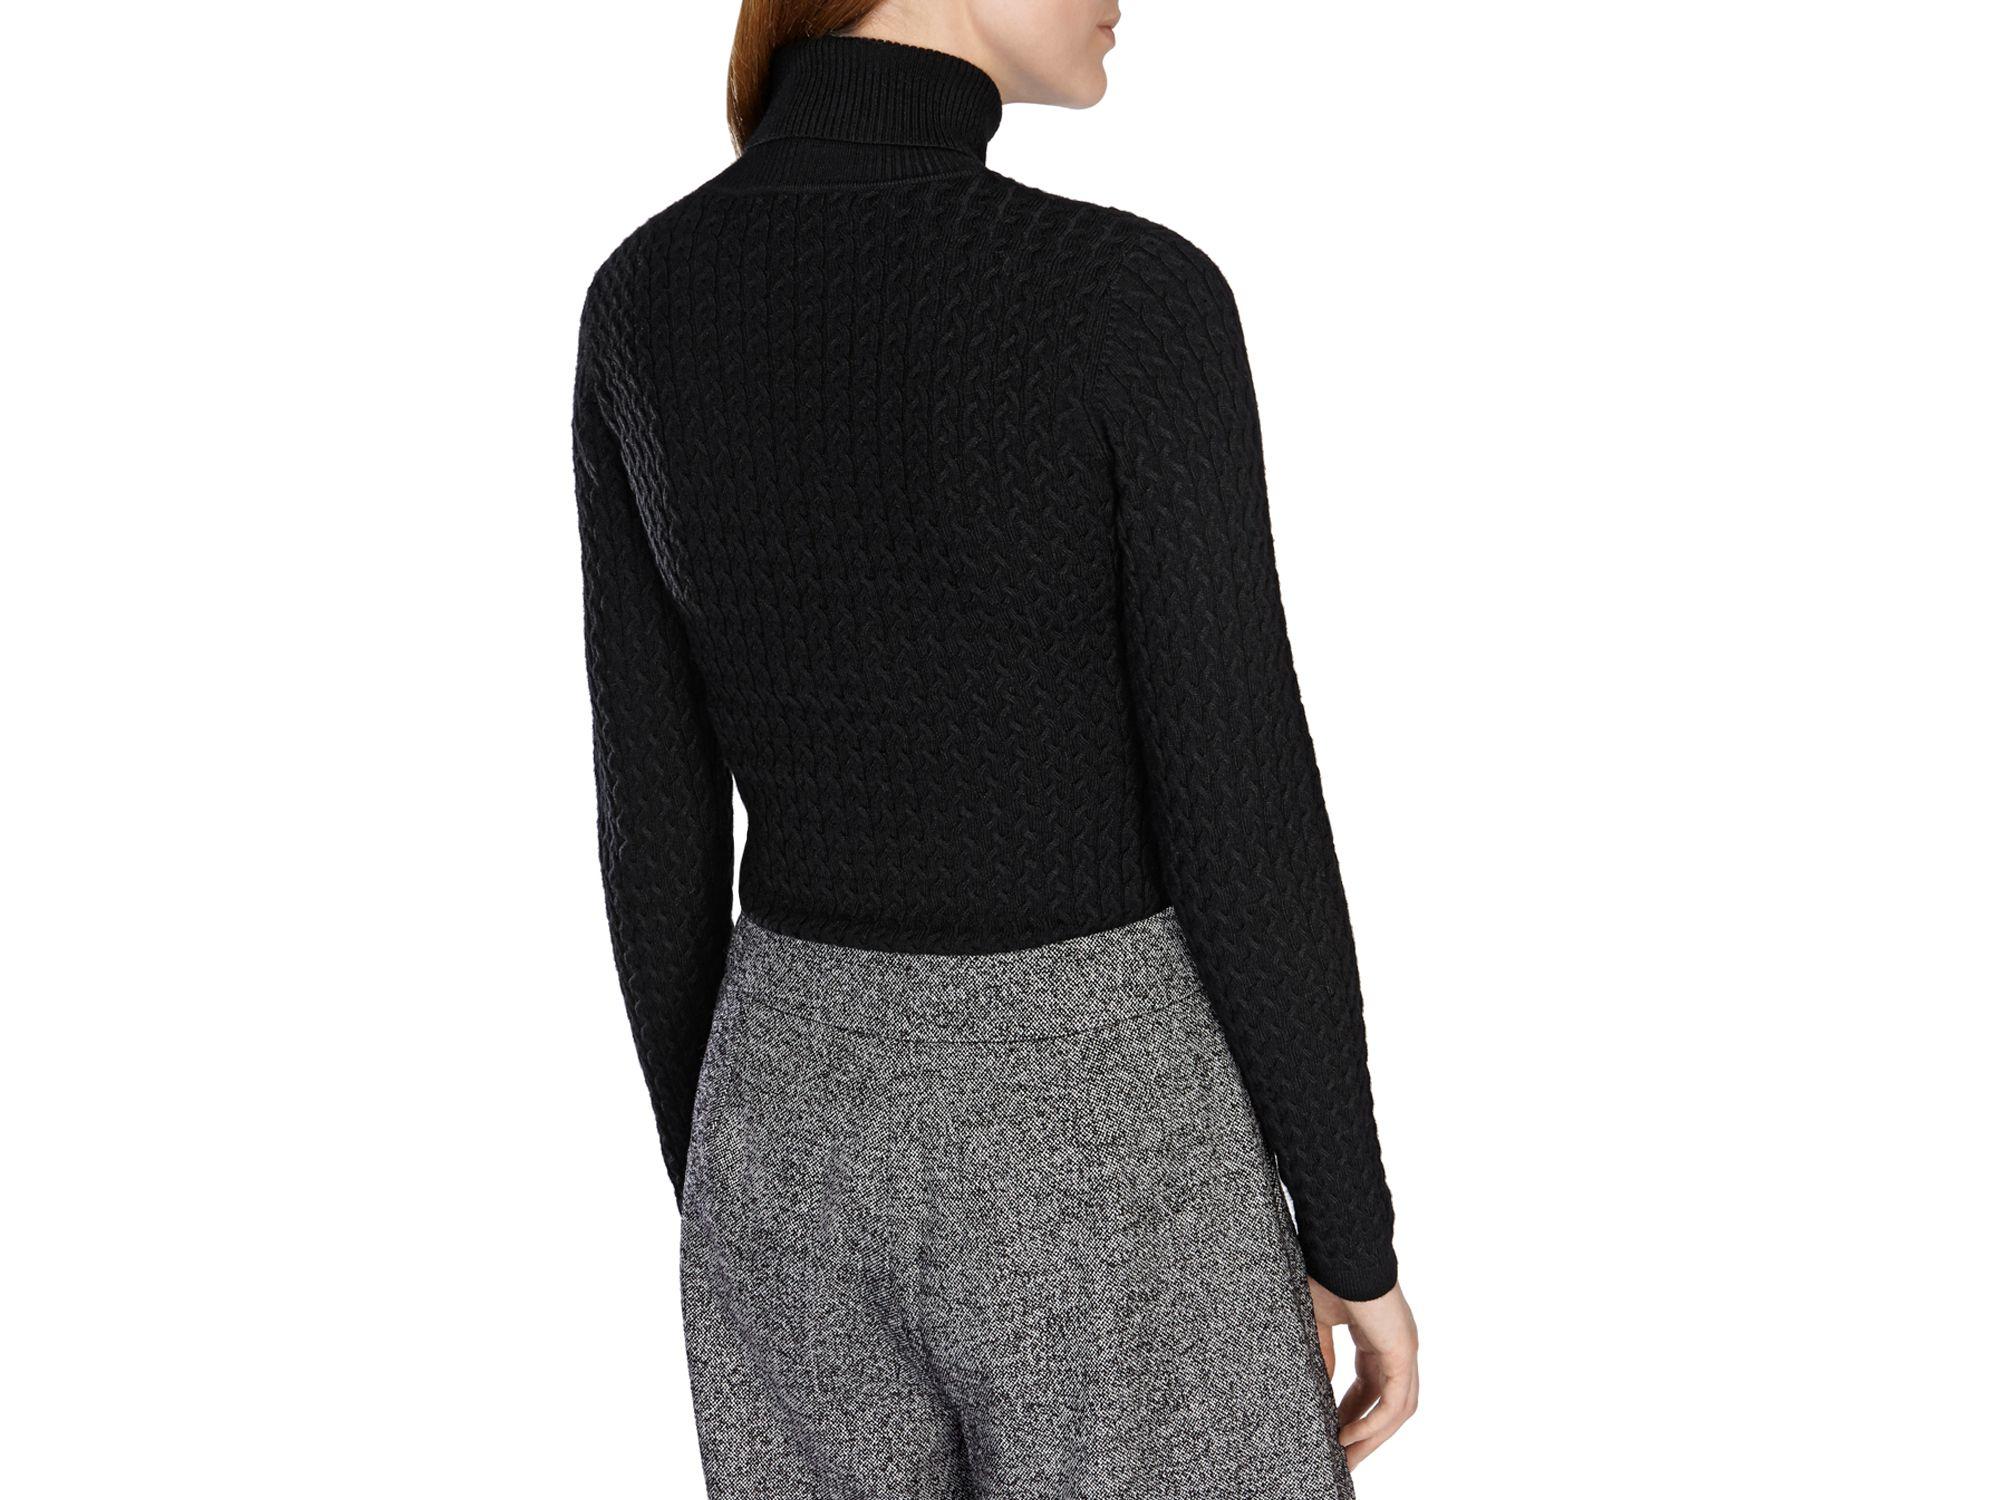 Karen millen Fine Gauge Cable Knit Sweater in Black | Lyst